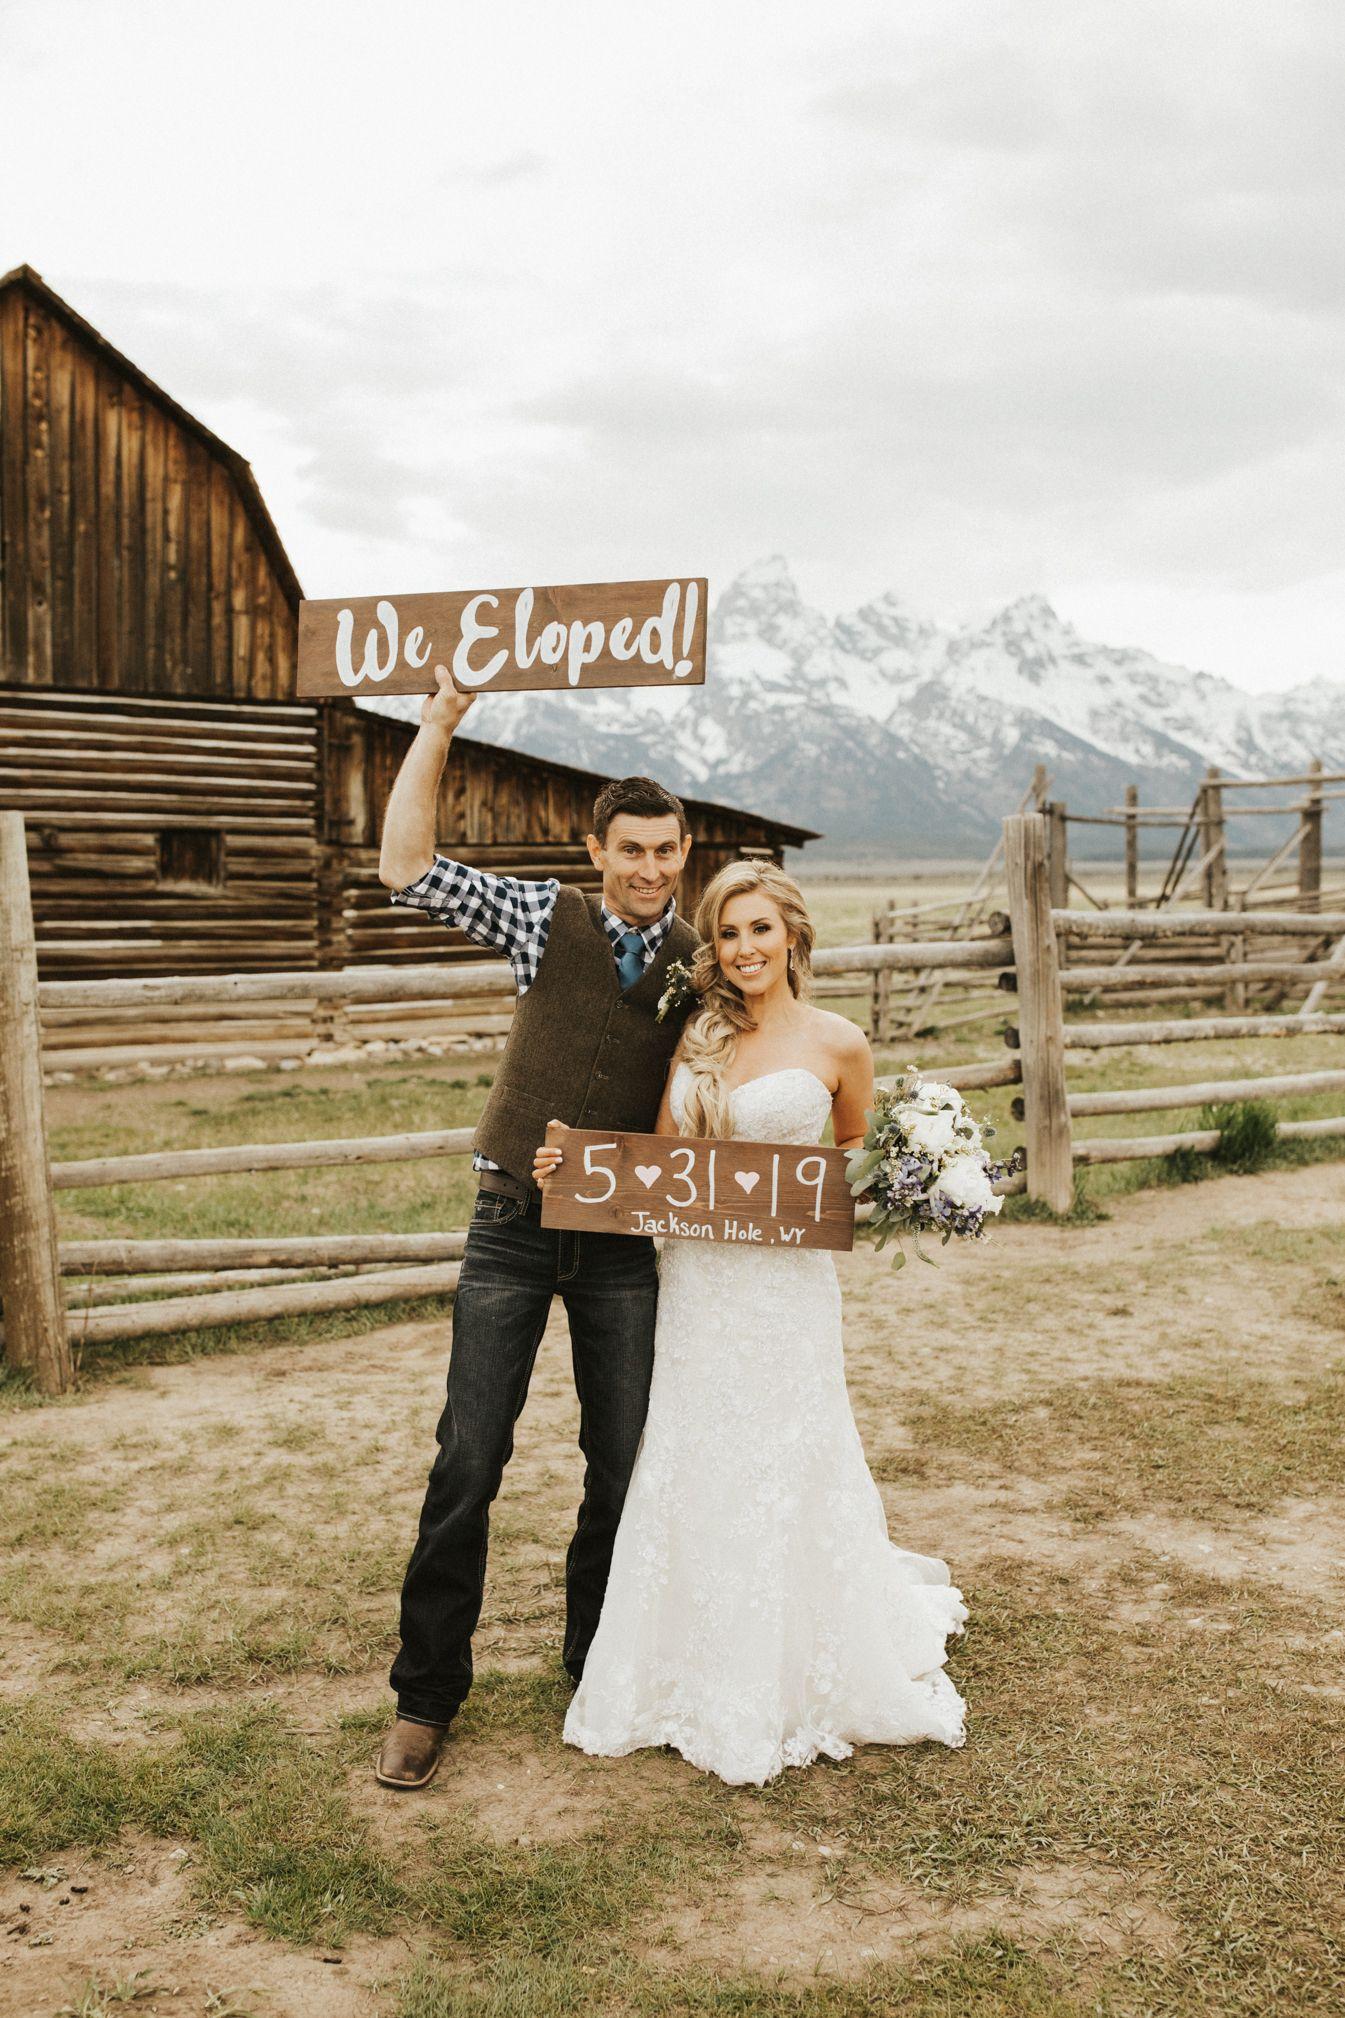 Jackson Hole Grand Teton National Park Elopement Photos Calder Photography Wyoming Weddings Jackson Hole Wedding Jackson Hole